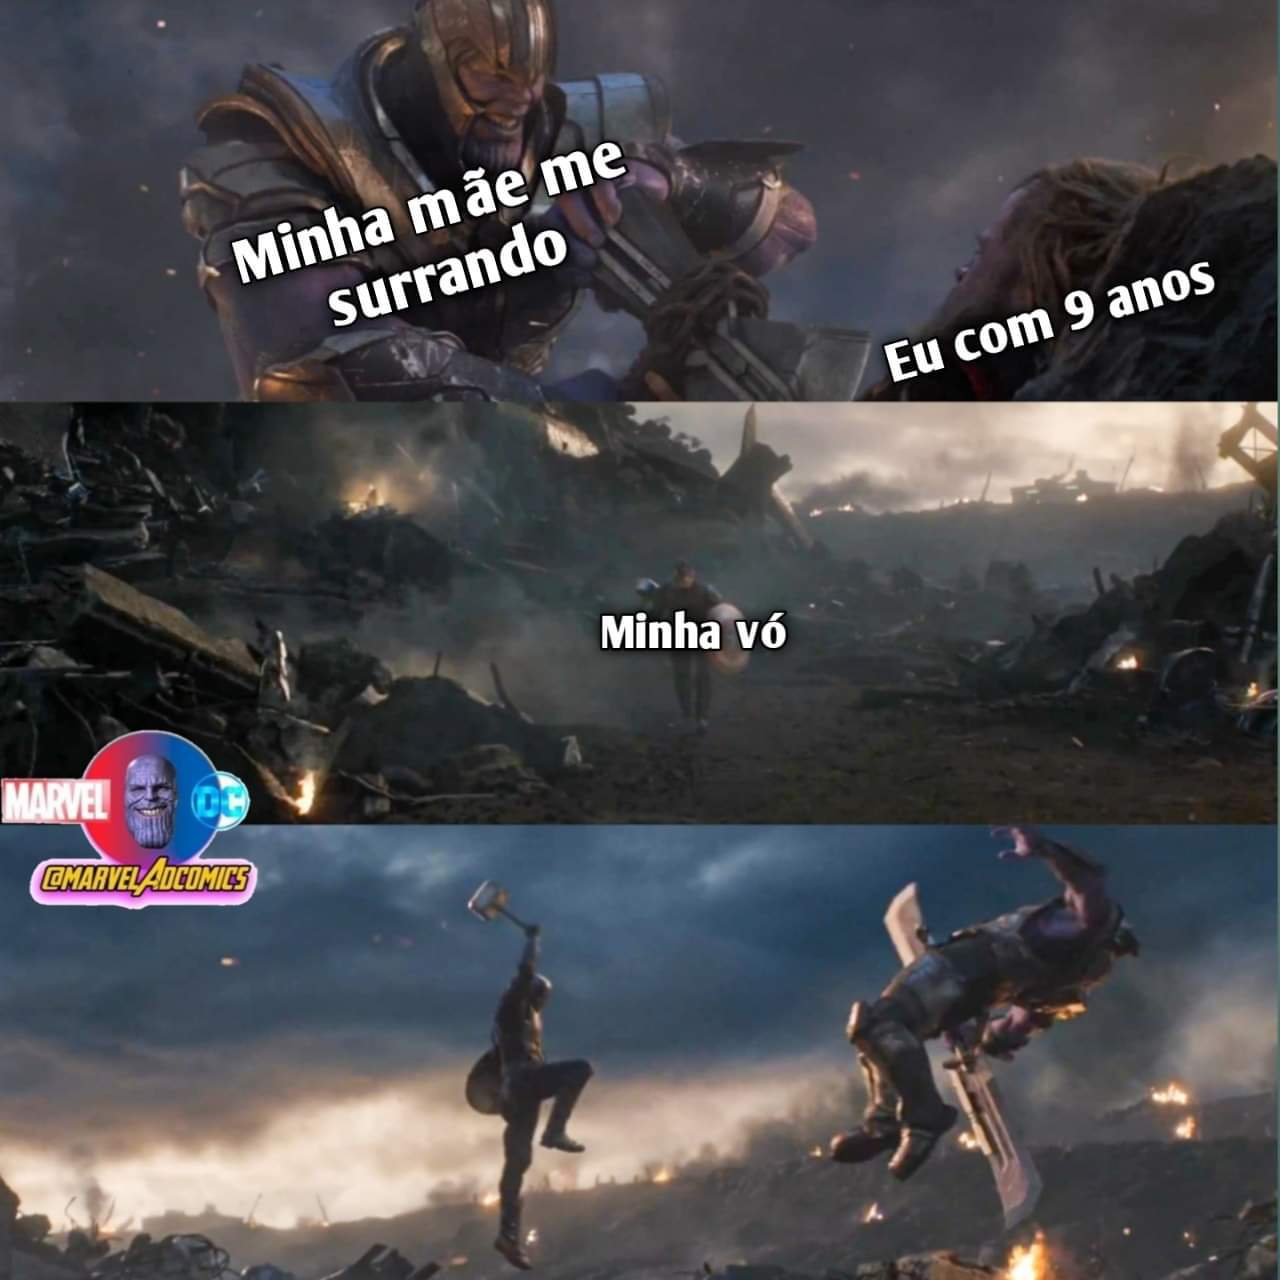 socorro vó - meme